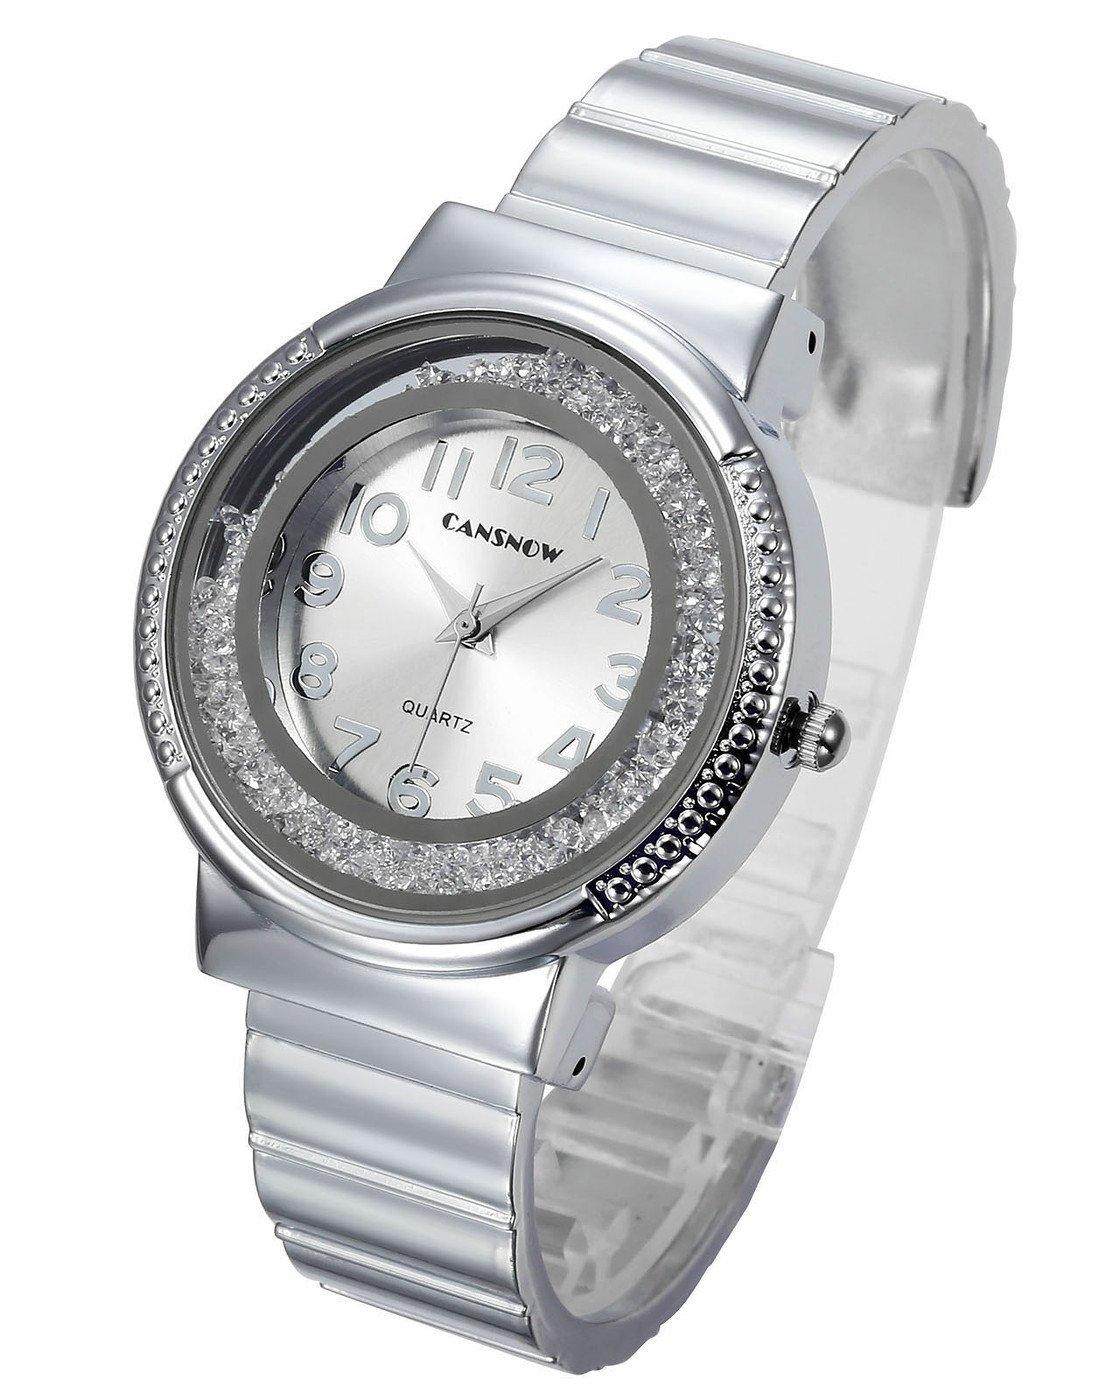 Top Plaza Women Ladies Casual Luxury Gold Silver Rose Gold Tone Alloy Analog Quartz Bracelet Watch Round Case Rhinestones Decorated Elegant Dress Bangle Cuff Wristwatch-Silver #2